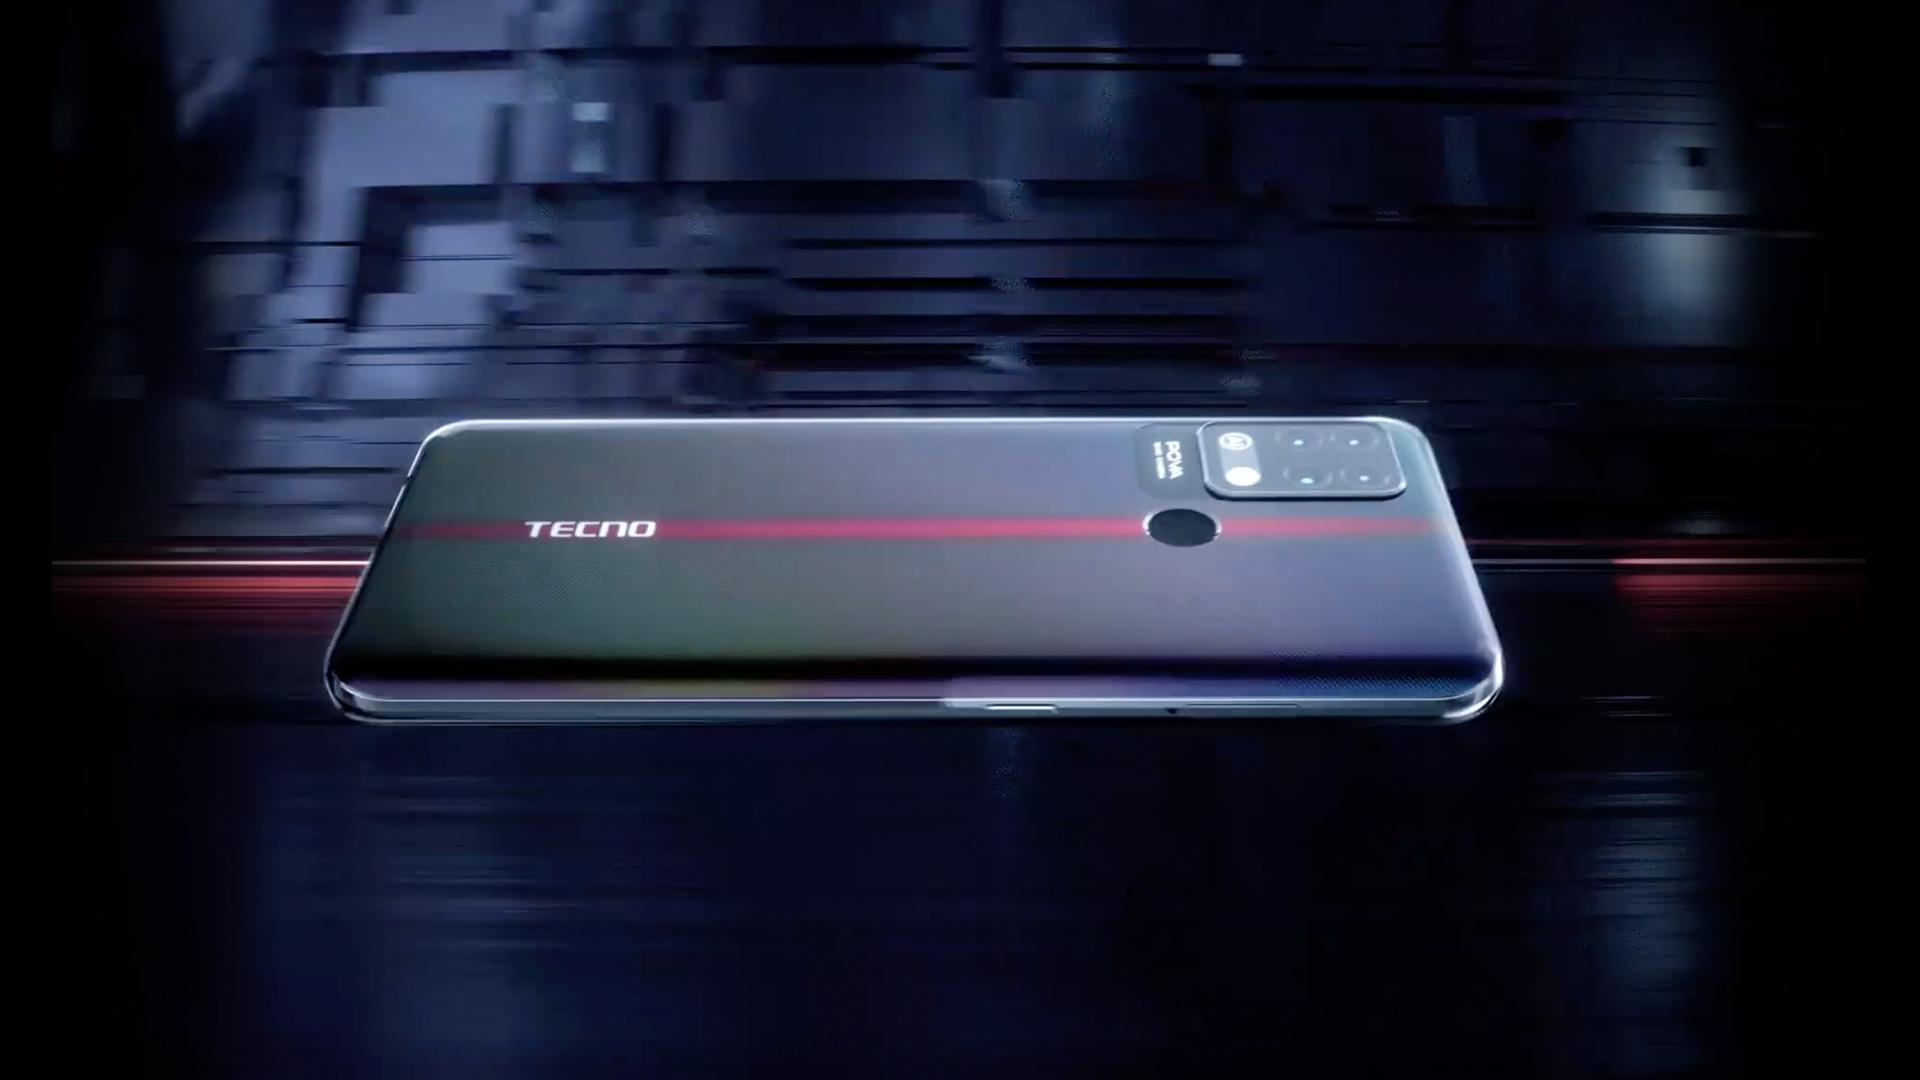 TECNO POVA - TECNO (Global) - TECNO Mobile